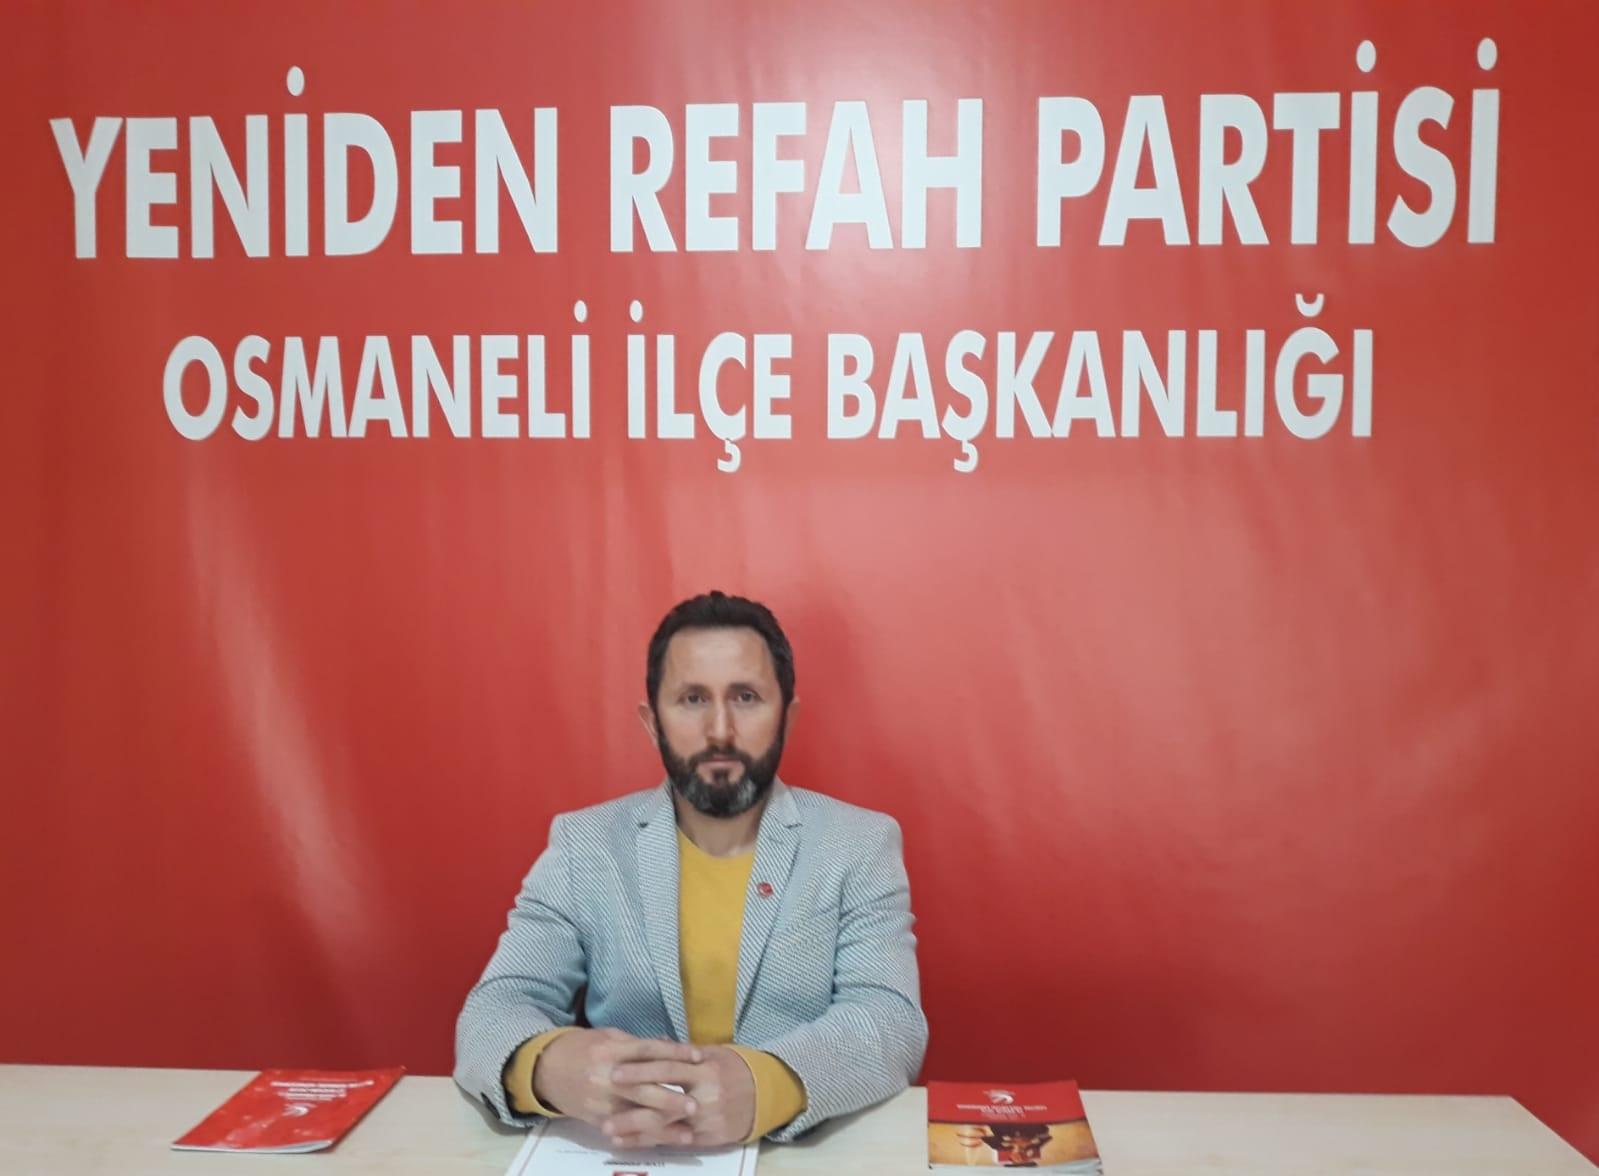 """KIDEM TAZMİNATI KIRMIZI ÇİZGİMİZDİR"""